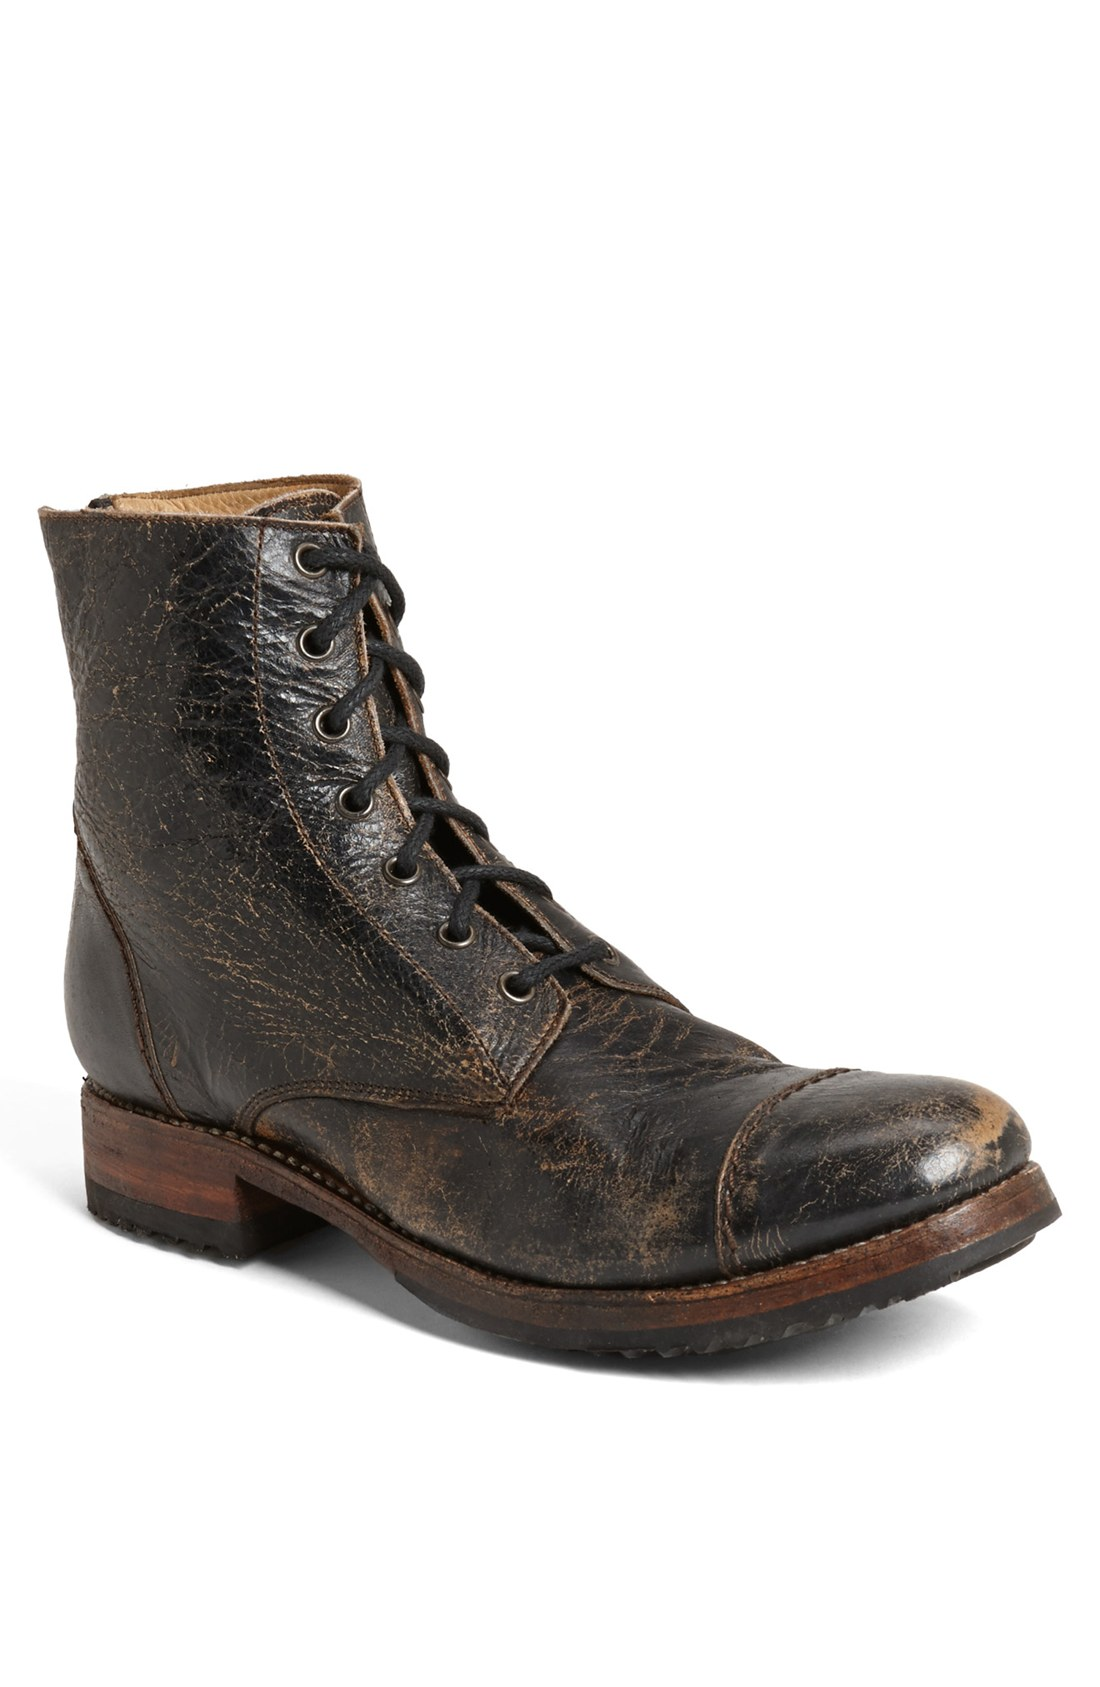 Bed Stu 'Protege' Cap Toe Boot in Black for Men   Lyst